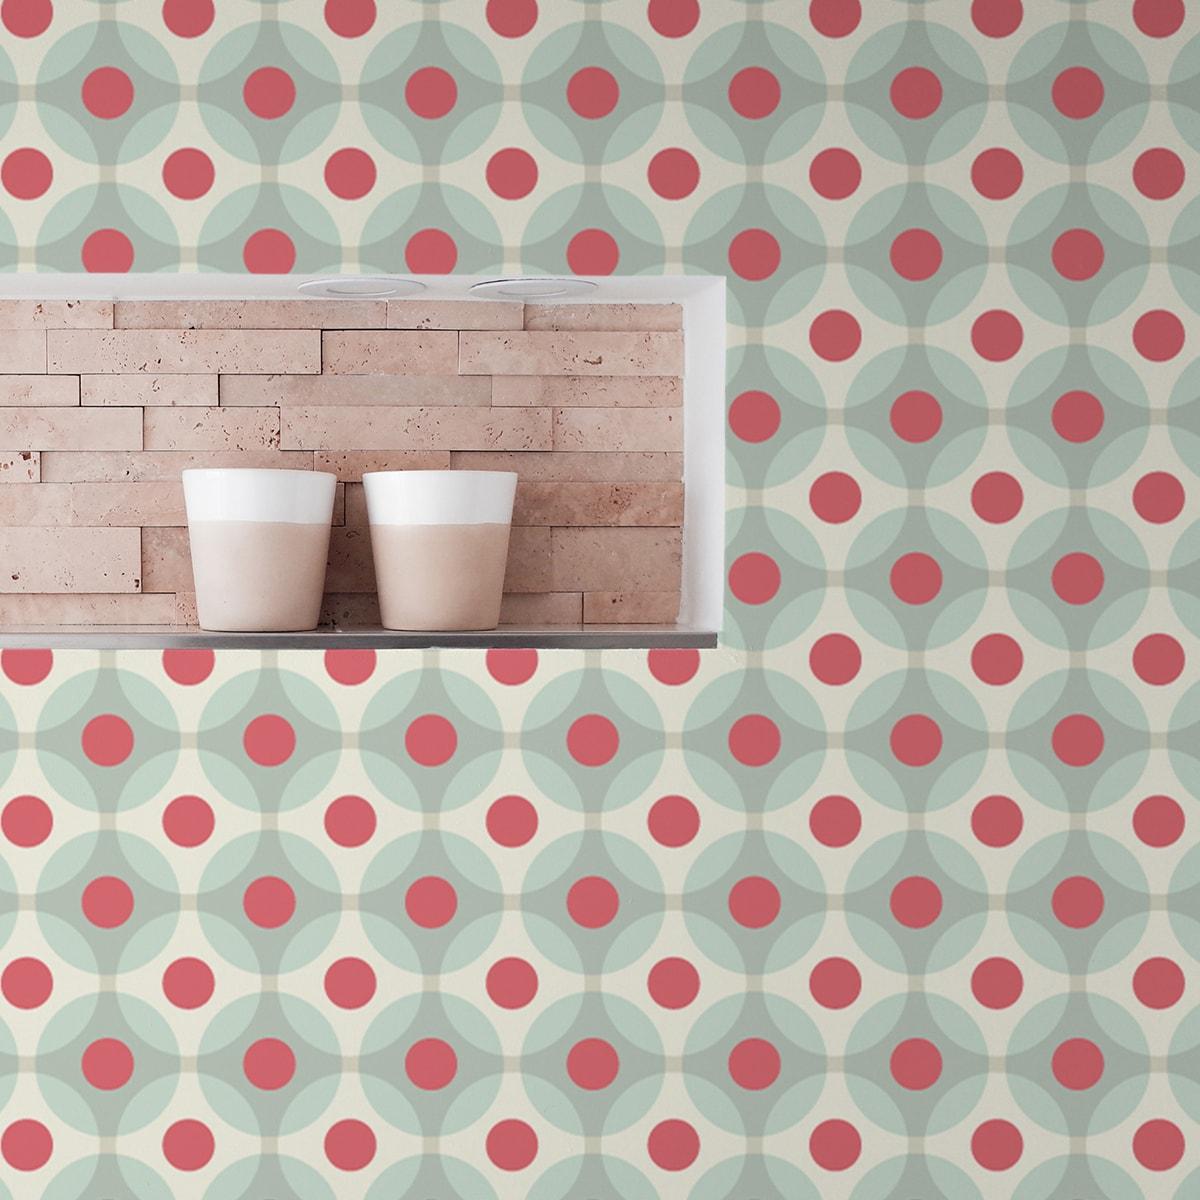 moderne retro tapete flower dots mit gro en punkten gmm. Black Bedroom Furniture Sets. Home Design Ideas